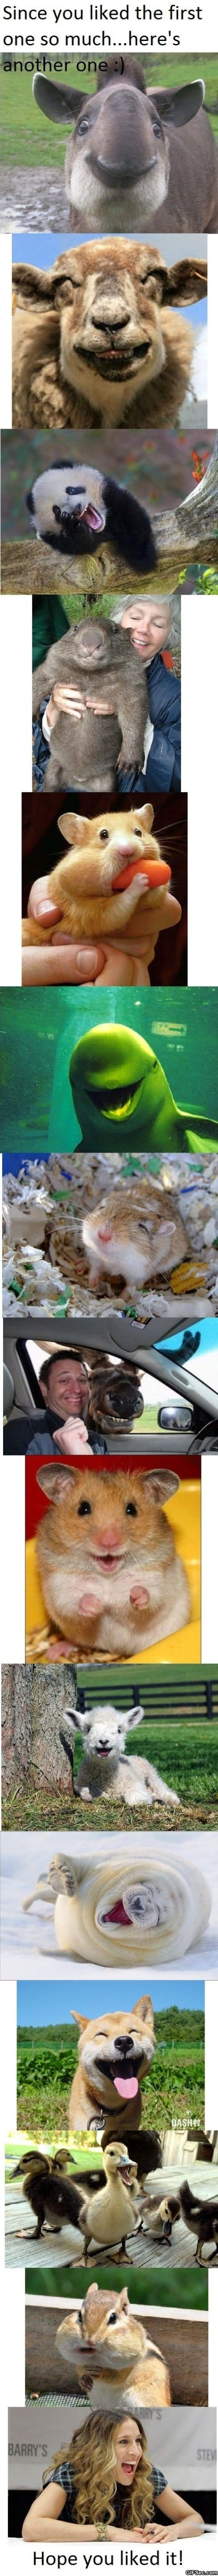 just-some-happy-animals